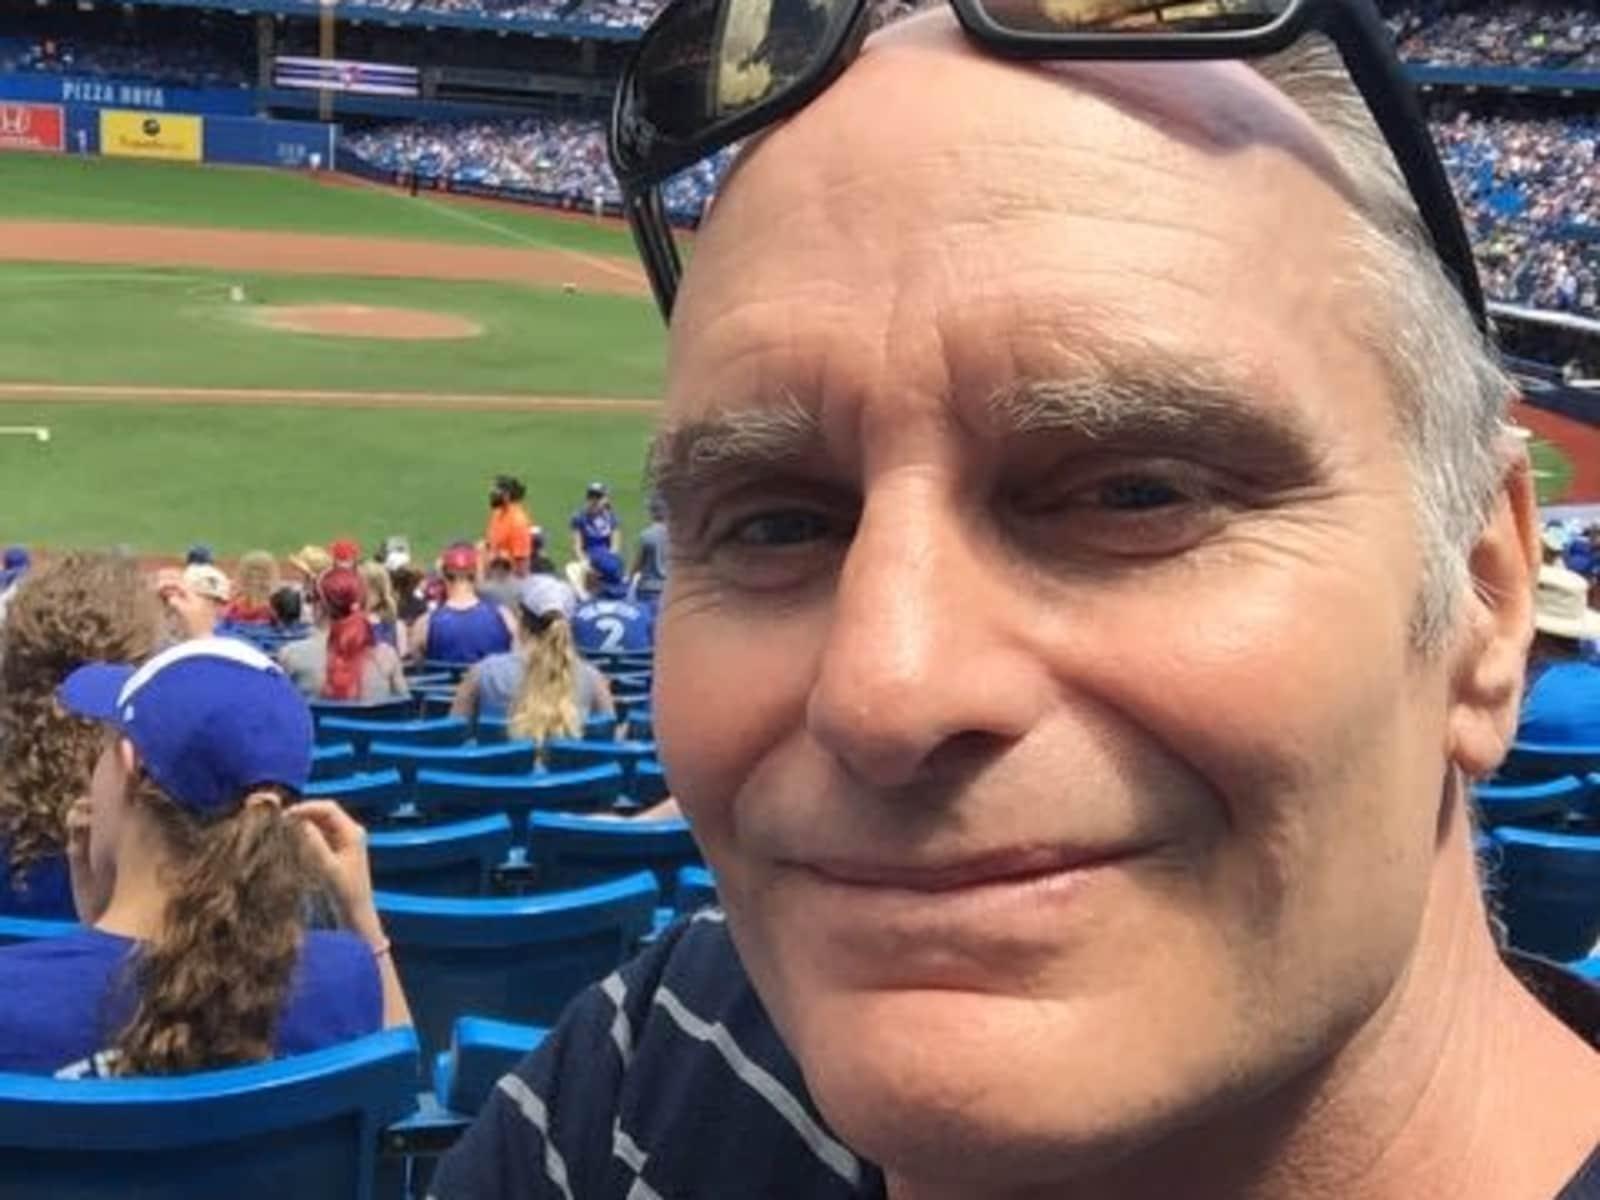 David from Toronto, Ontario, Canada